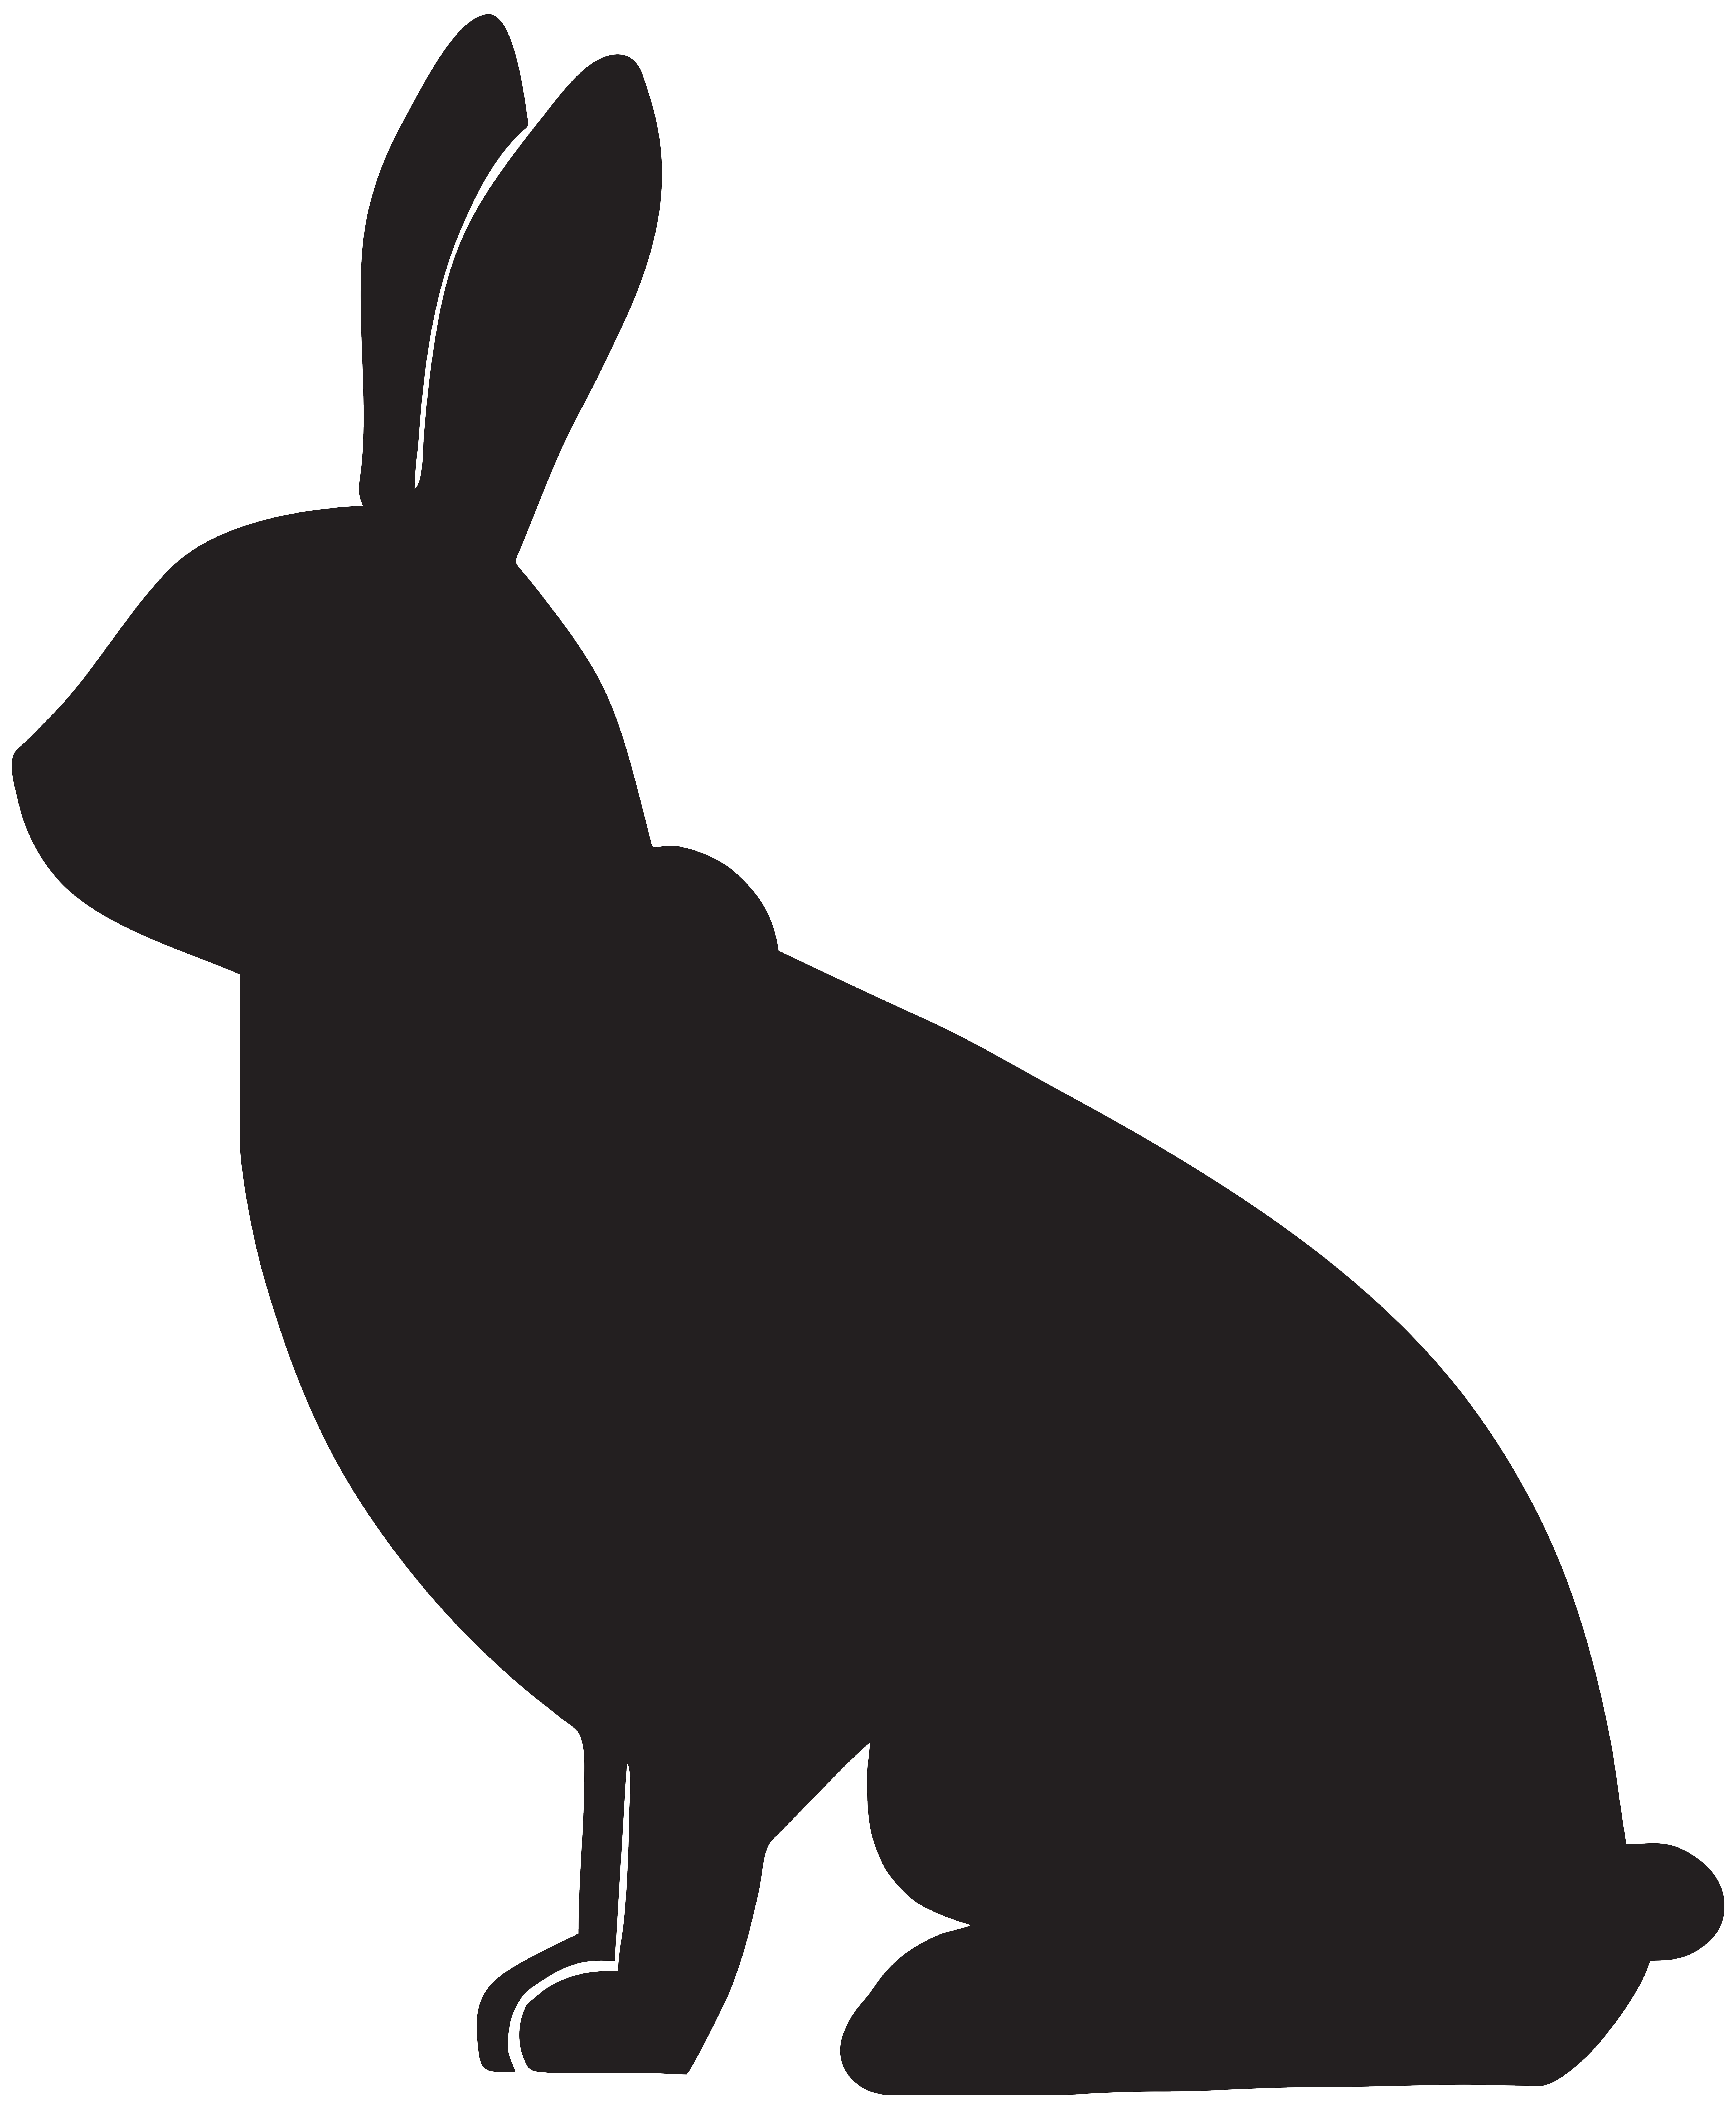 Hare clipart silhouette Art Rabbit Rabbit Image Clip